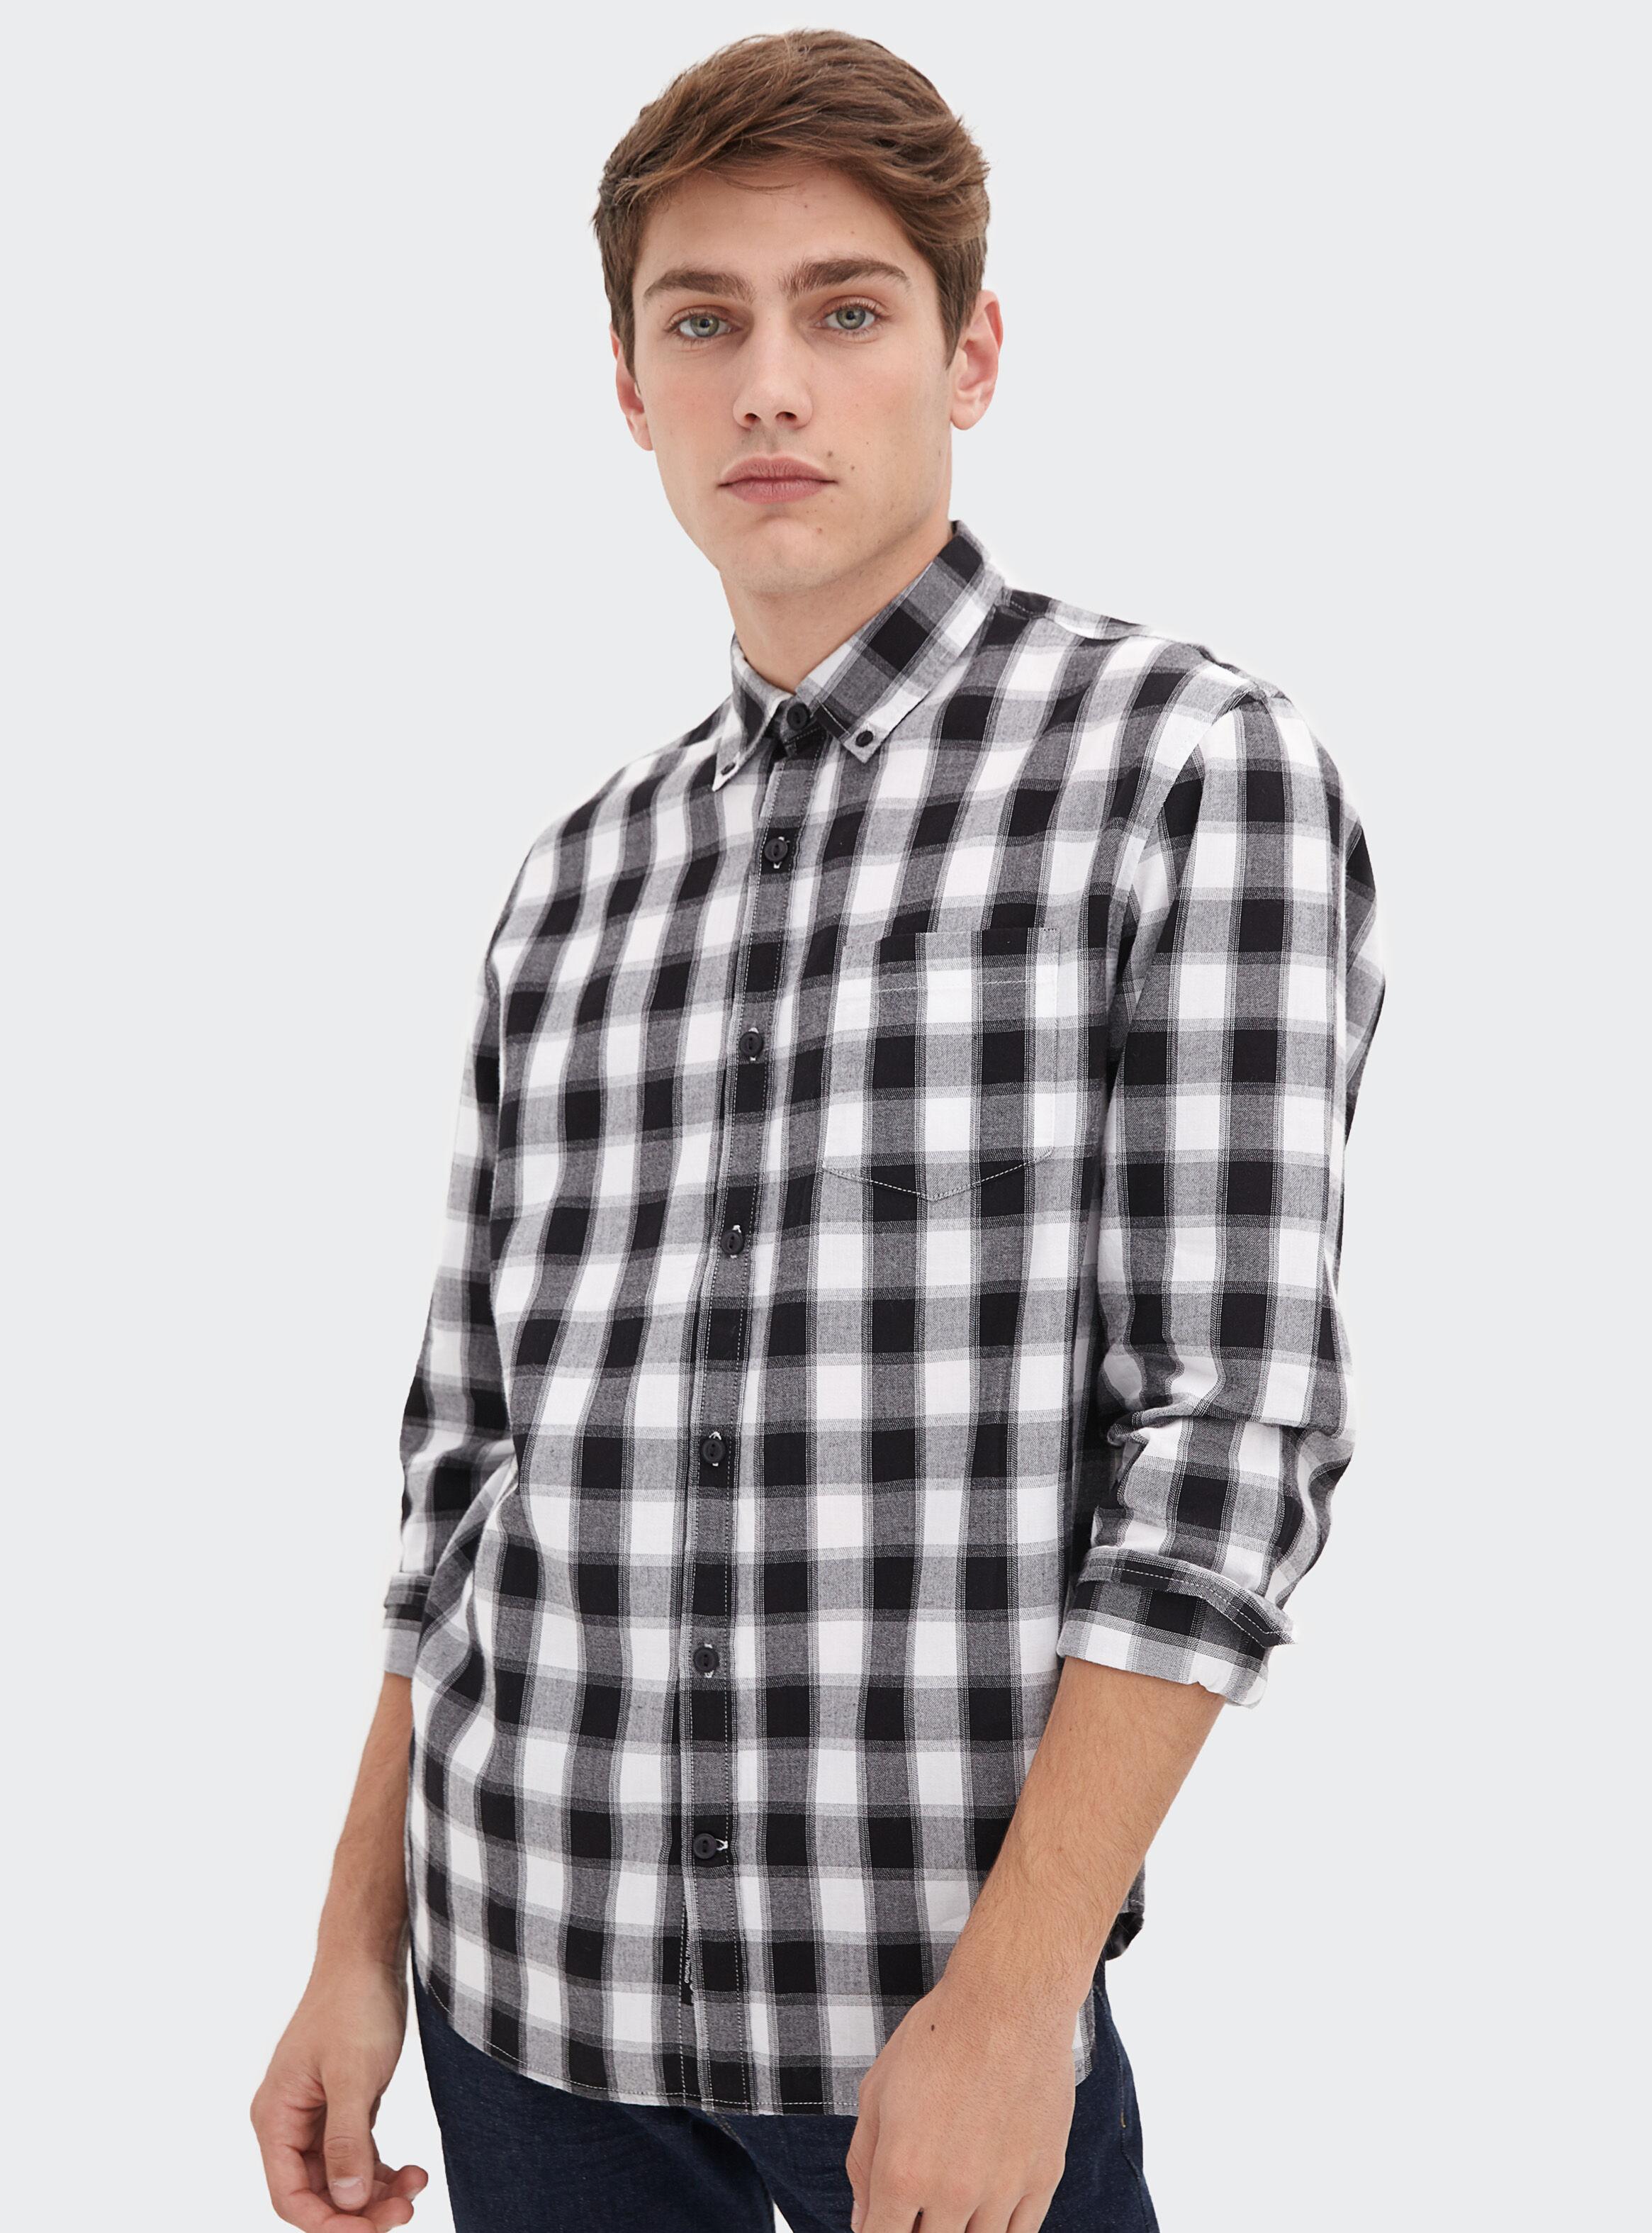 Moda Camisas Que La PrefieresParis cl lT1JcKF